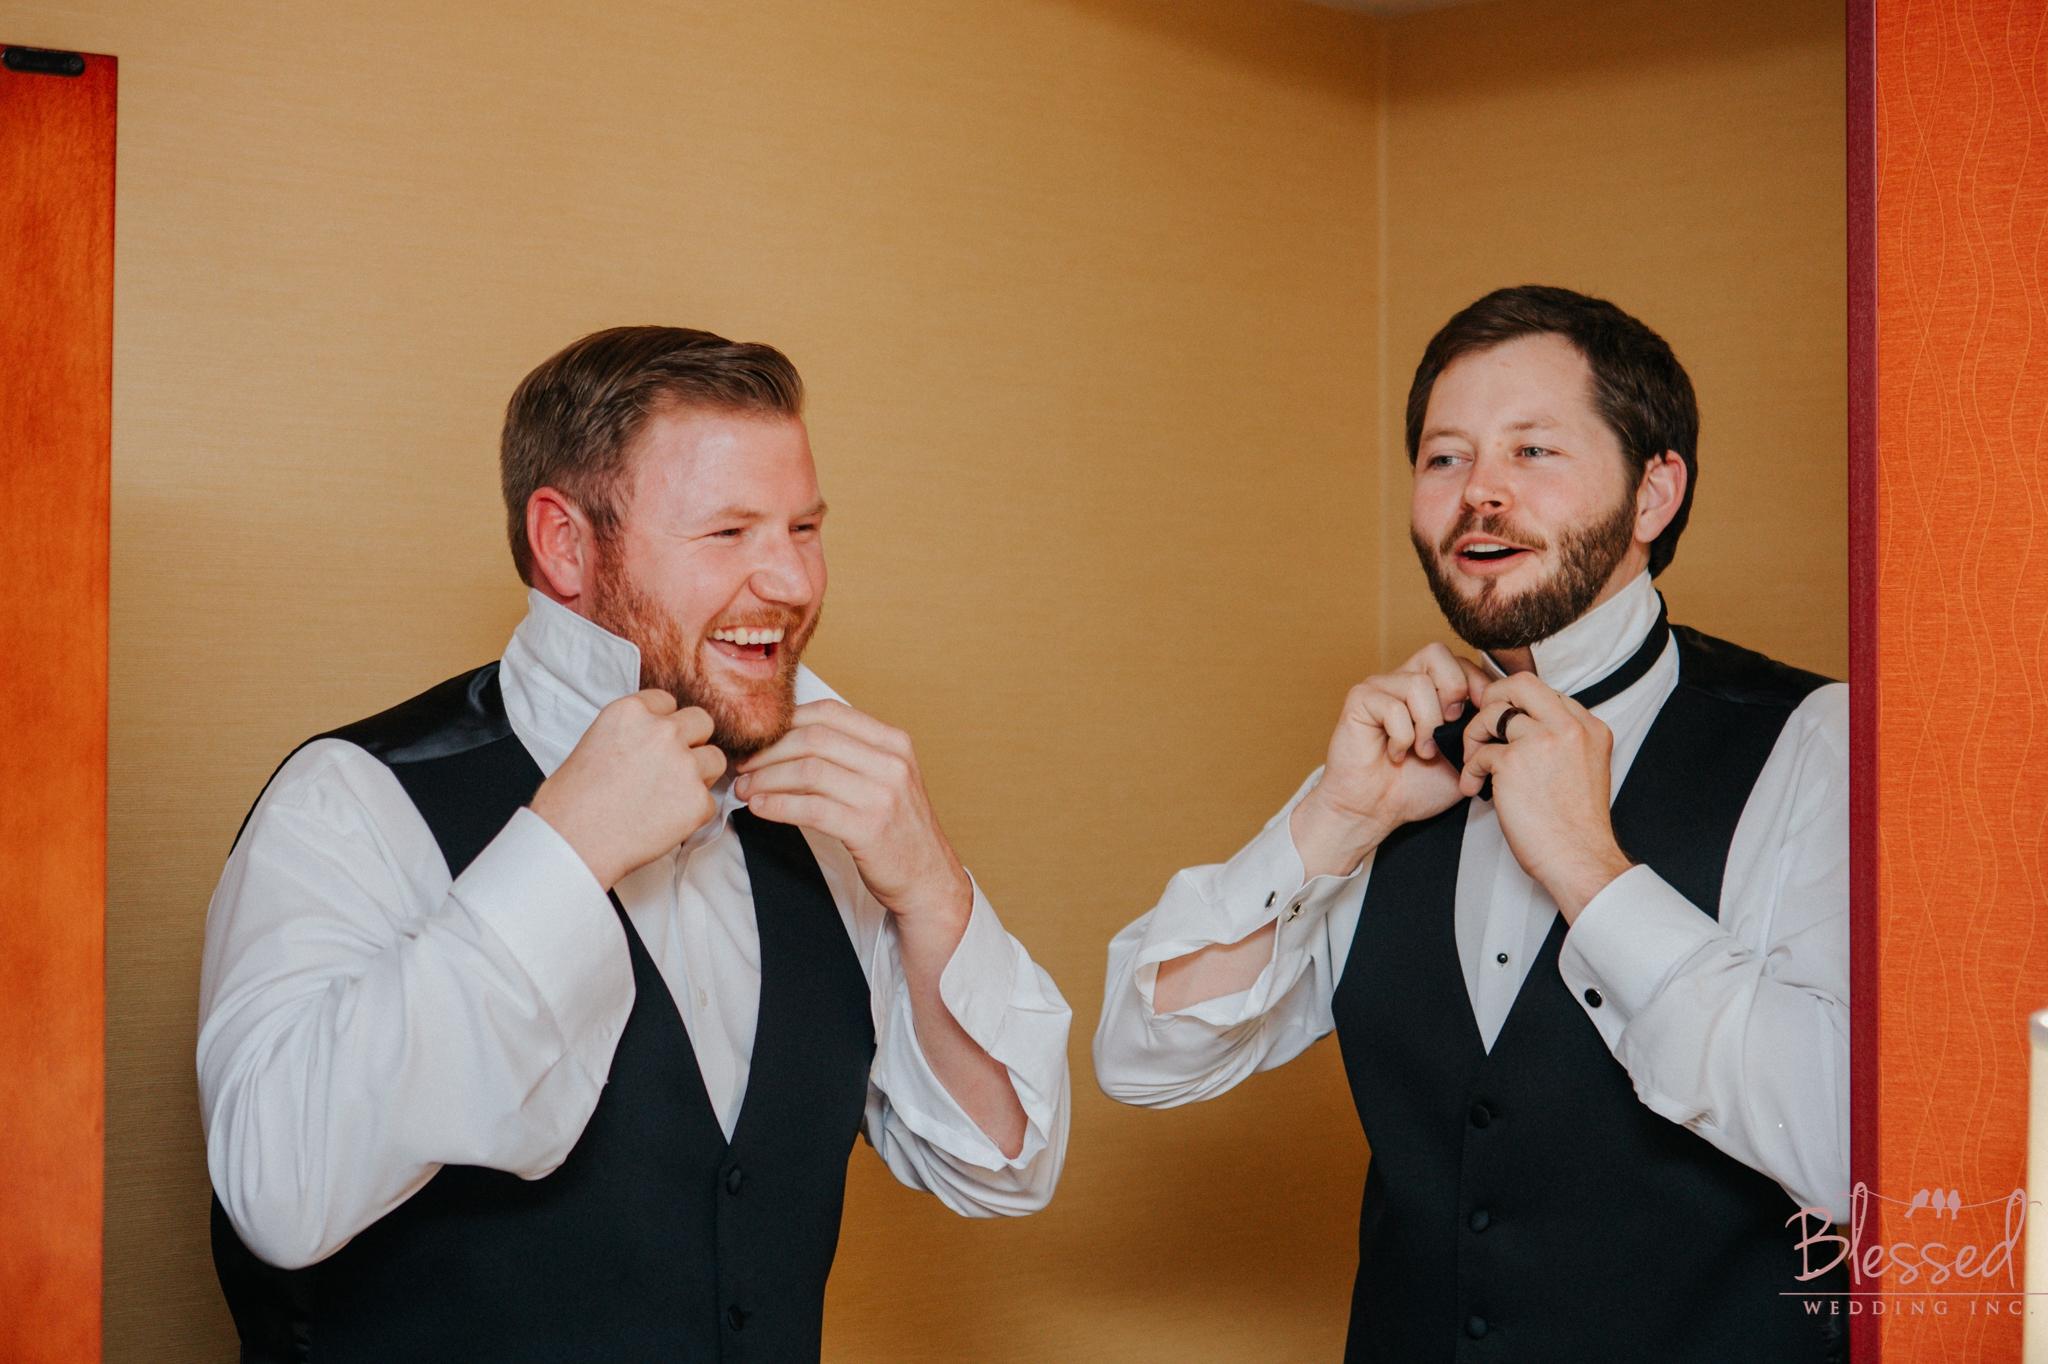 Orfila Vinery Wedding by Blessed Wedding Photography 7.jpg